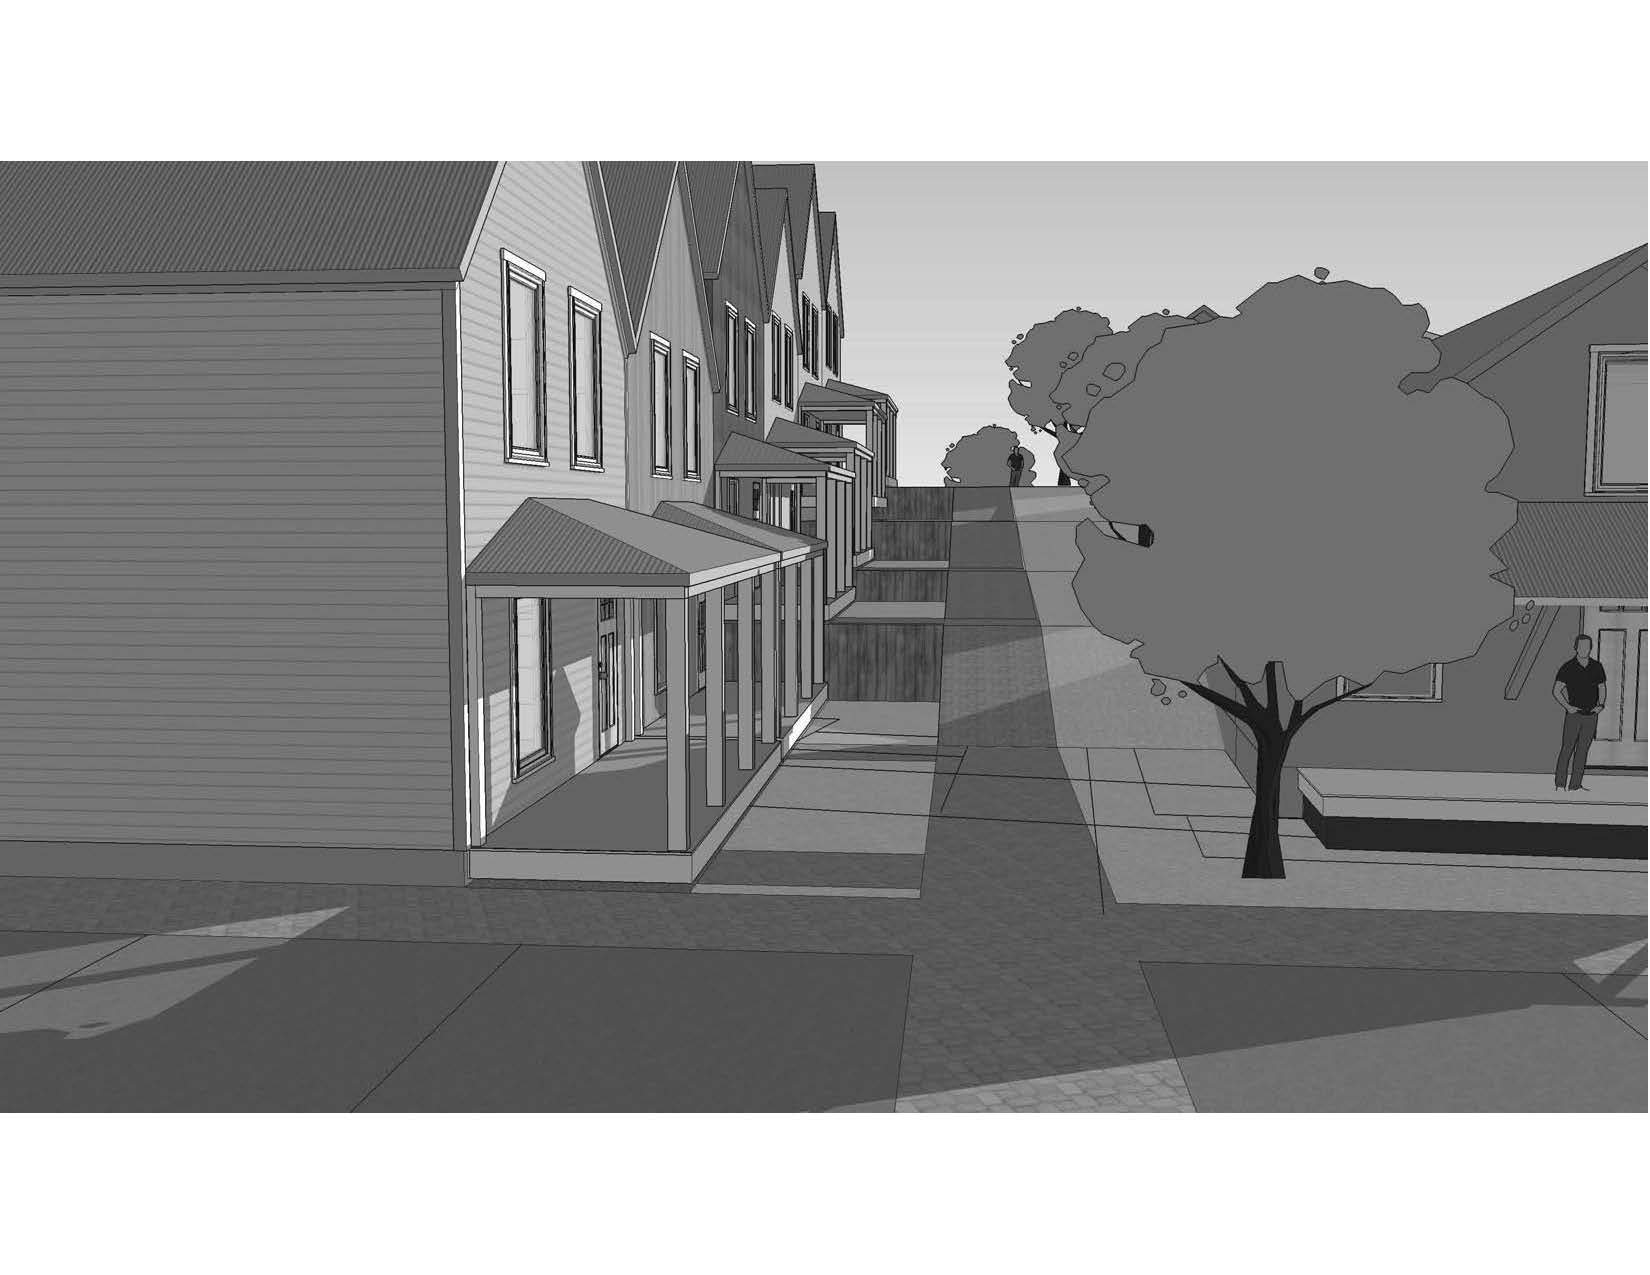 1712 brigham townhouse site rendered 9-1-2017 B&W 1_Page_3.jpg